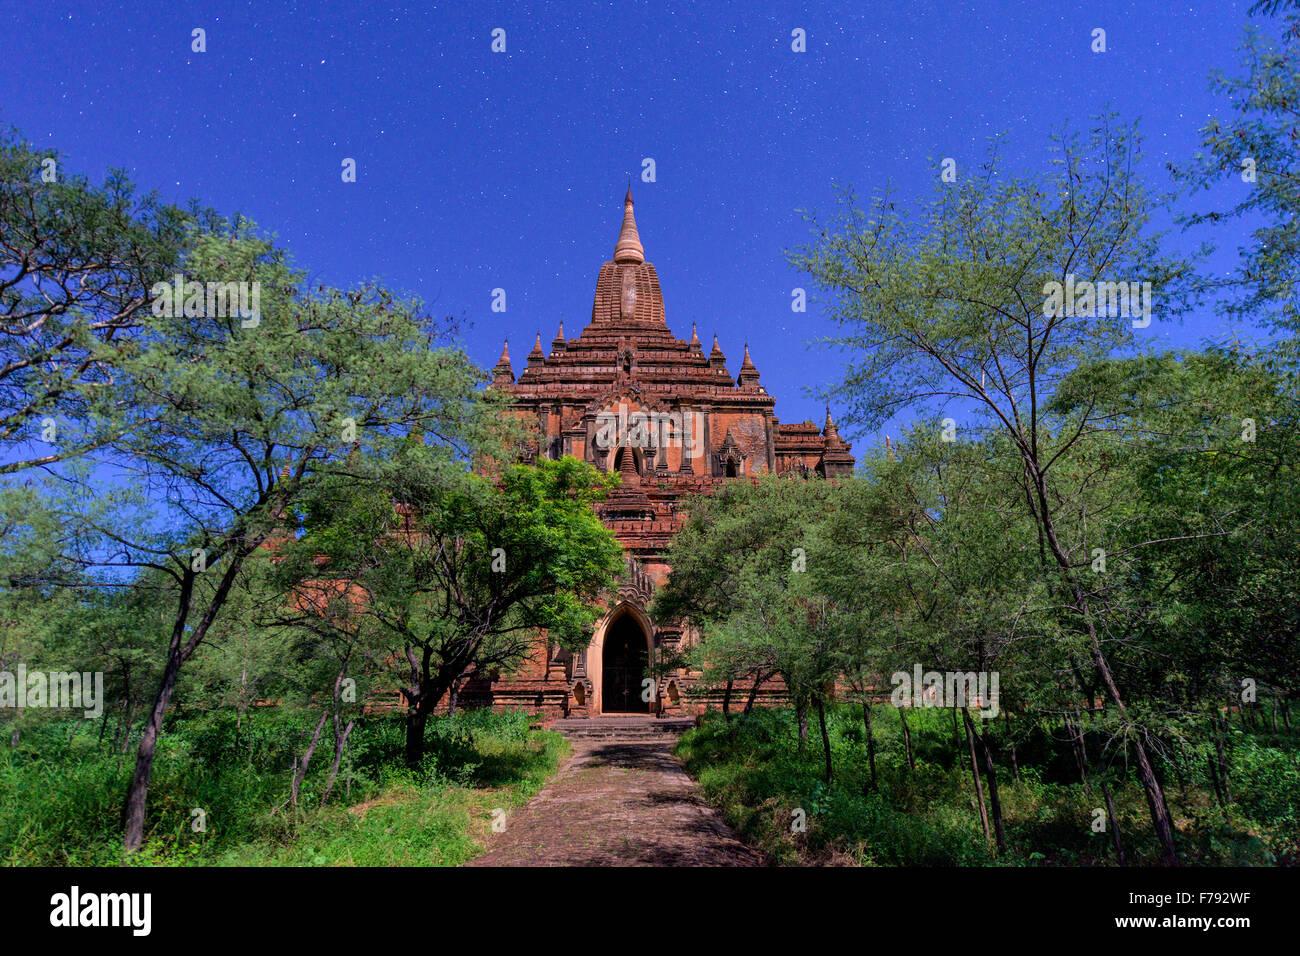 Bagan, Myanmar at Sulamani Temple at night. - Stock Image